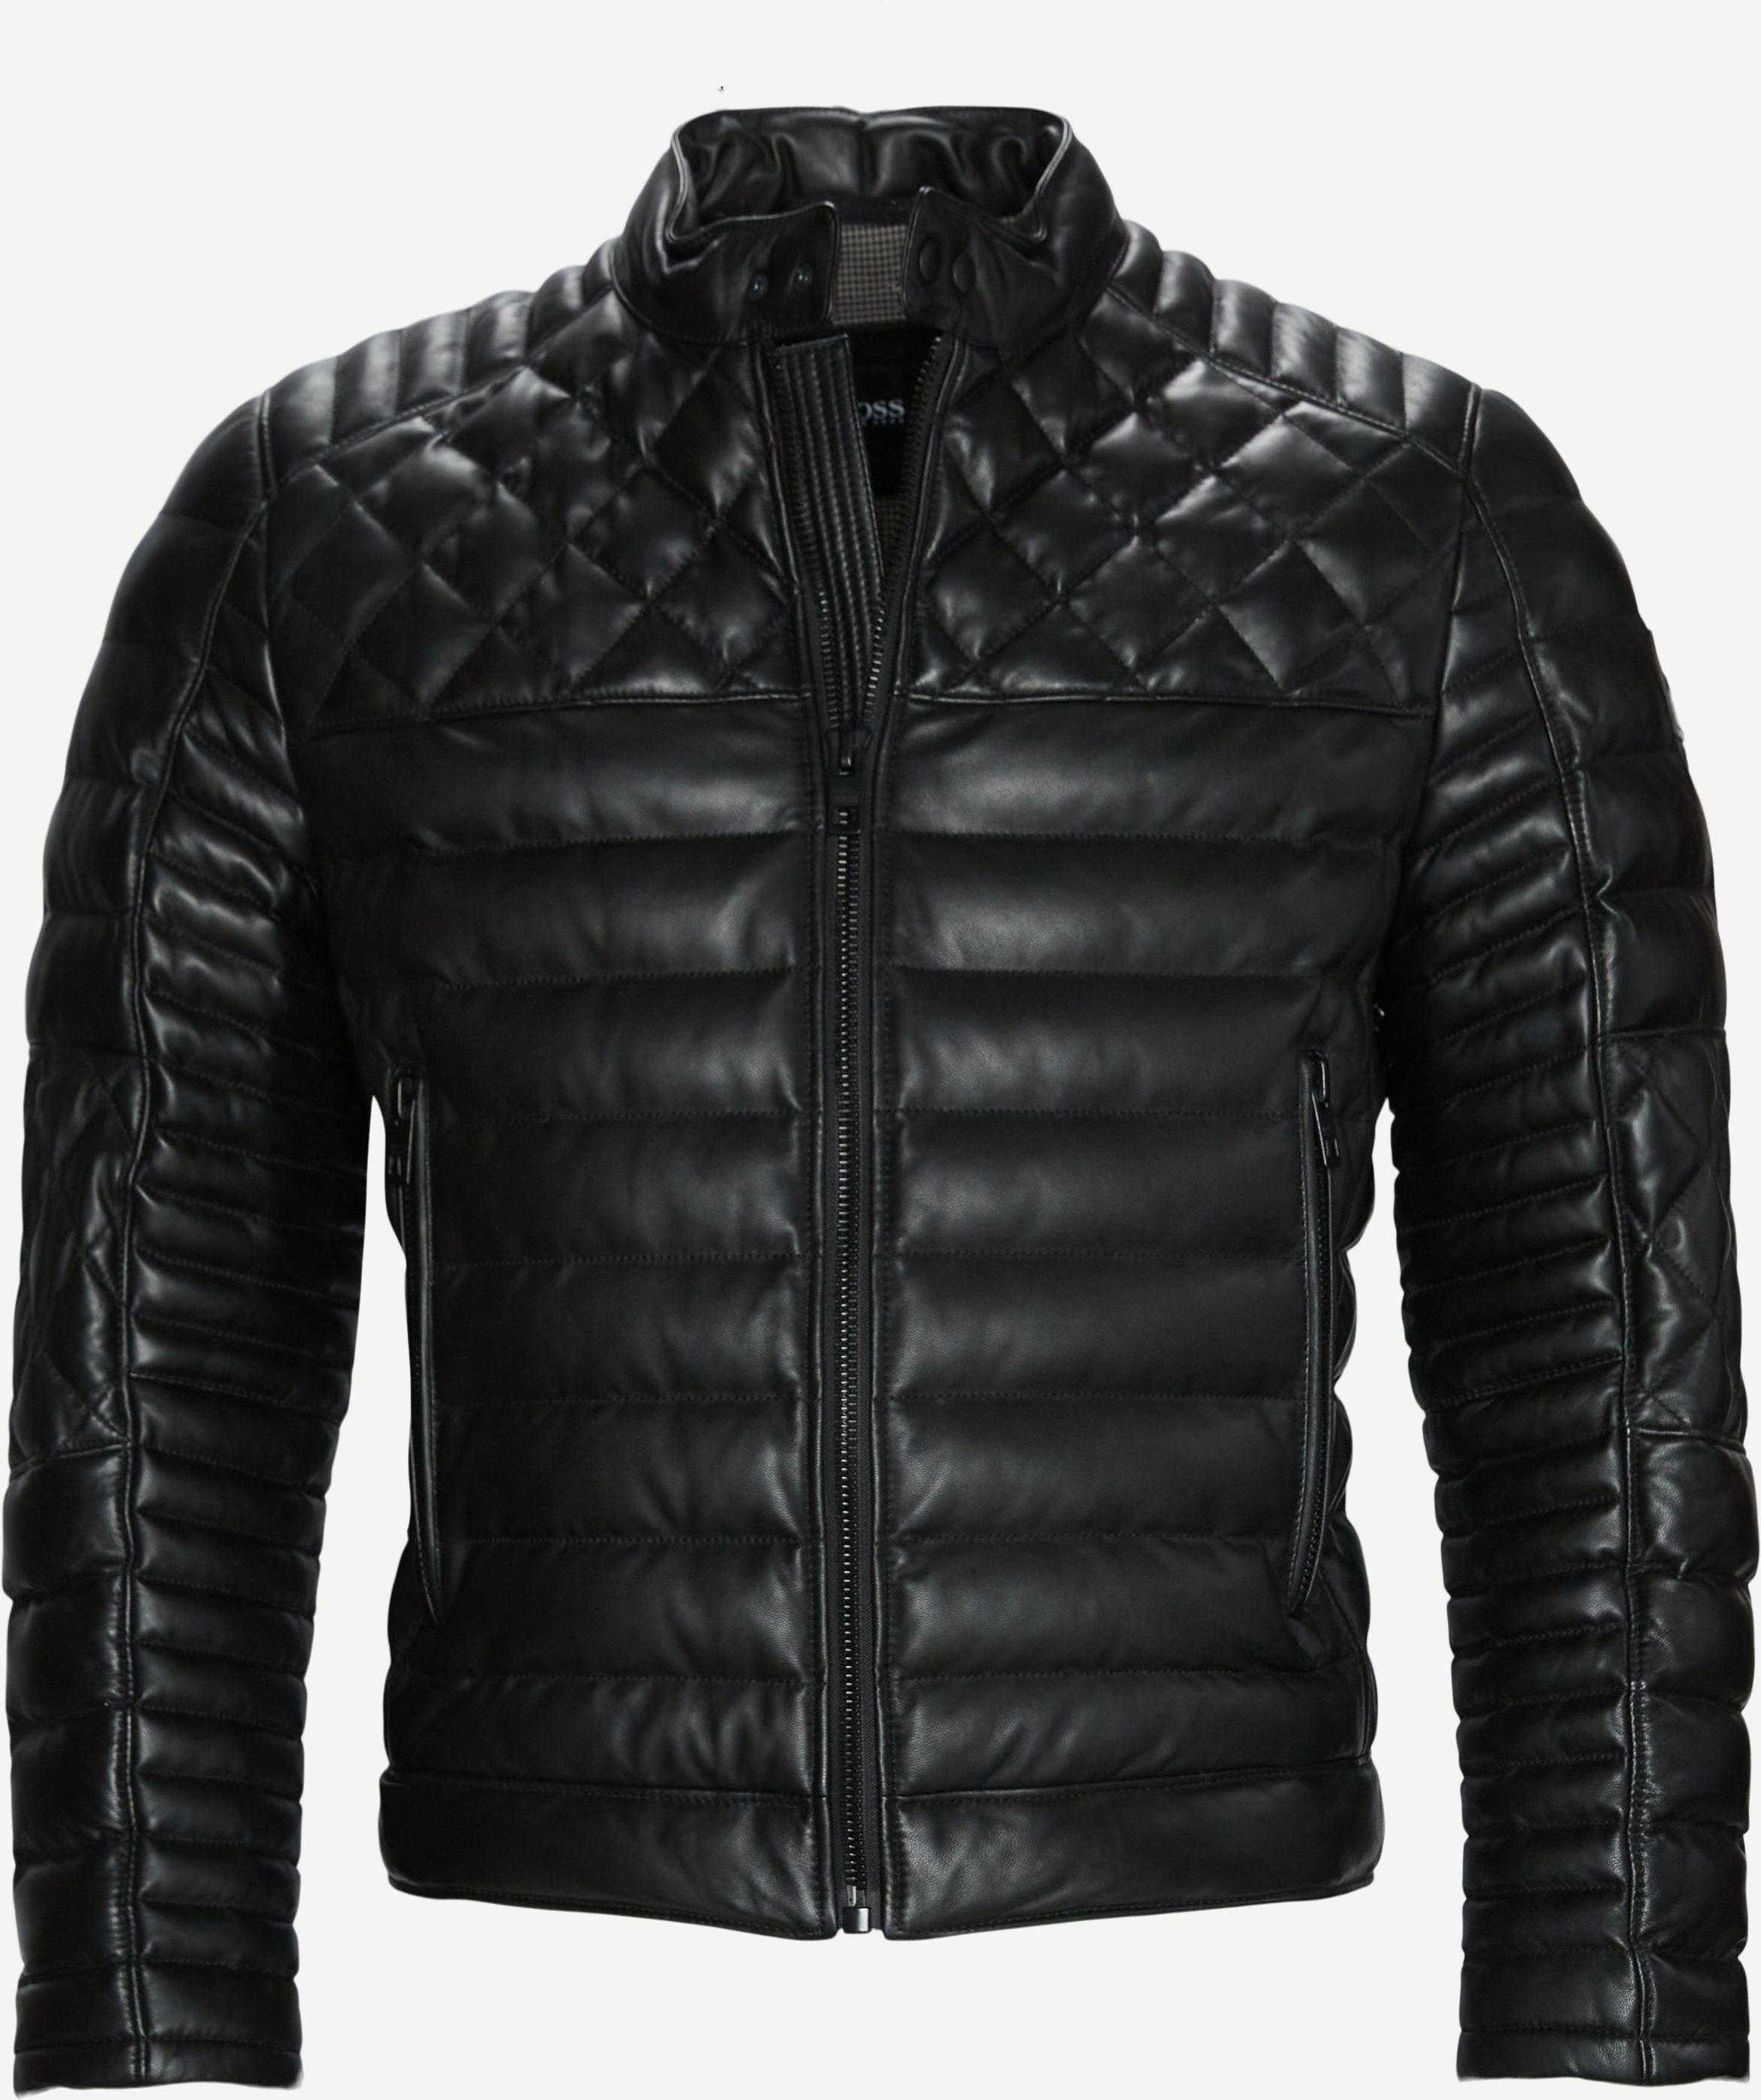 Jackets - Slim fit - Black